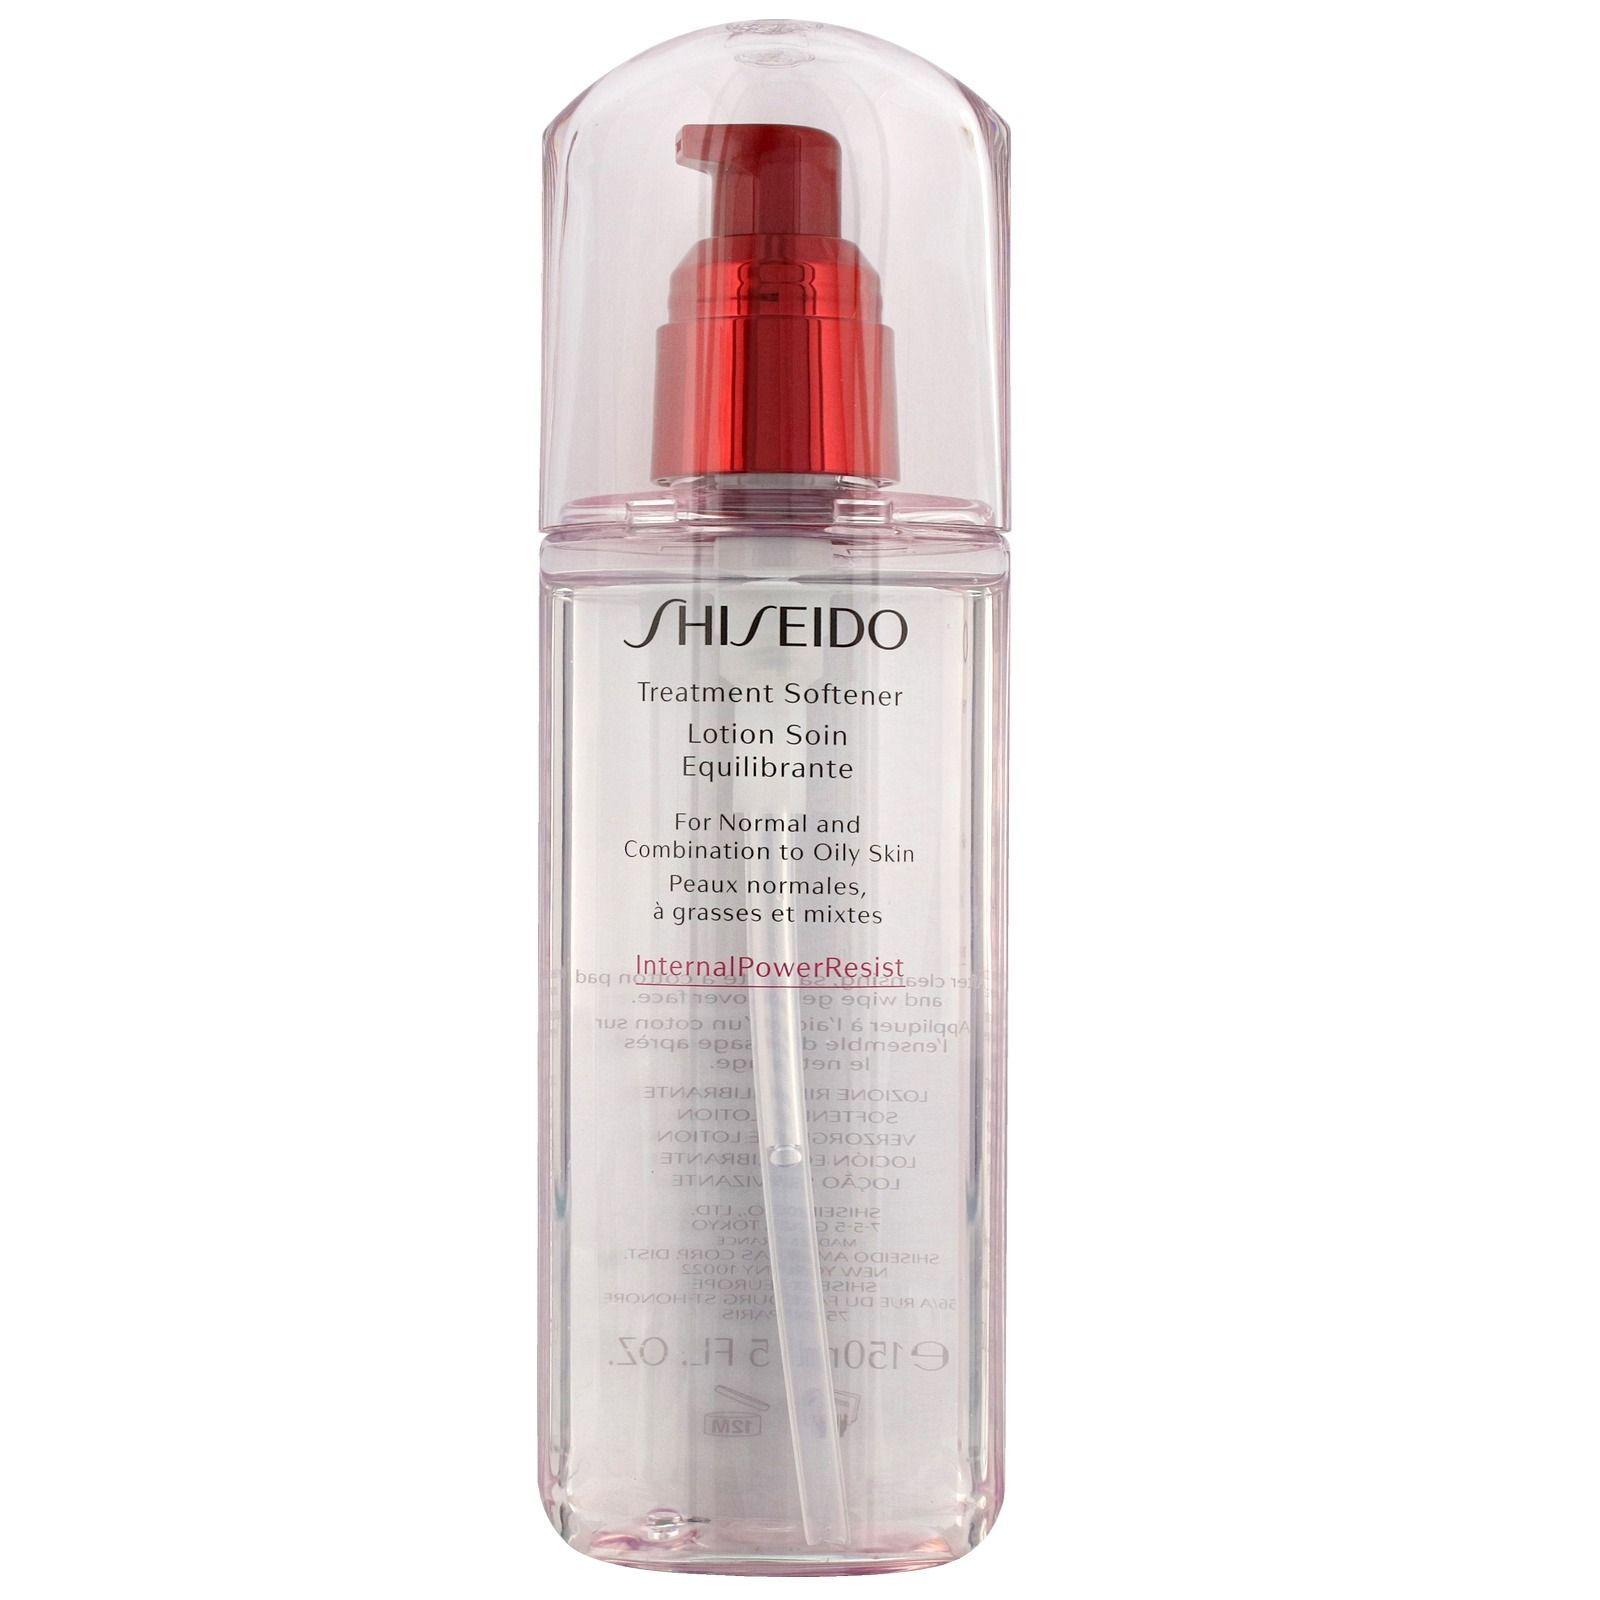 Shiseido Softeners & Balancing Lotions Trattamento Softener 150ml / 5 fl.oz.